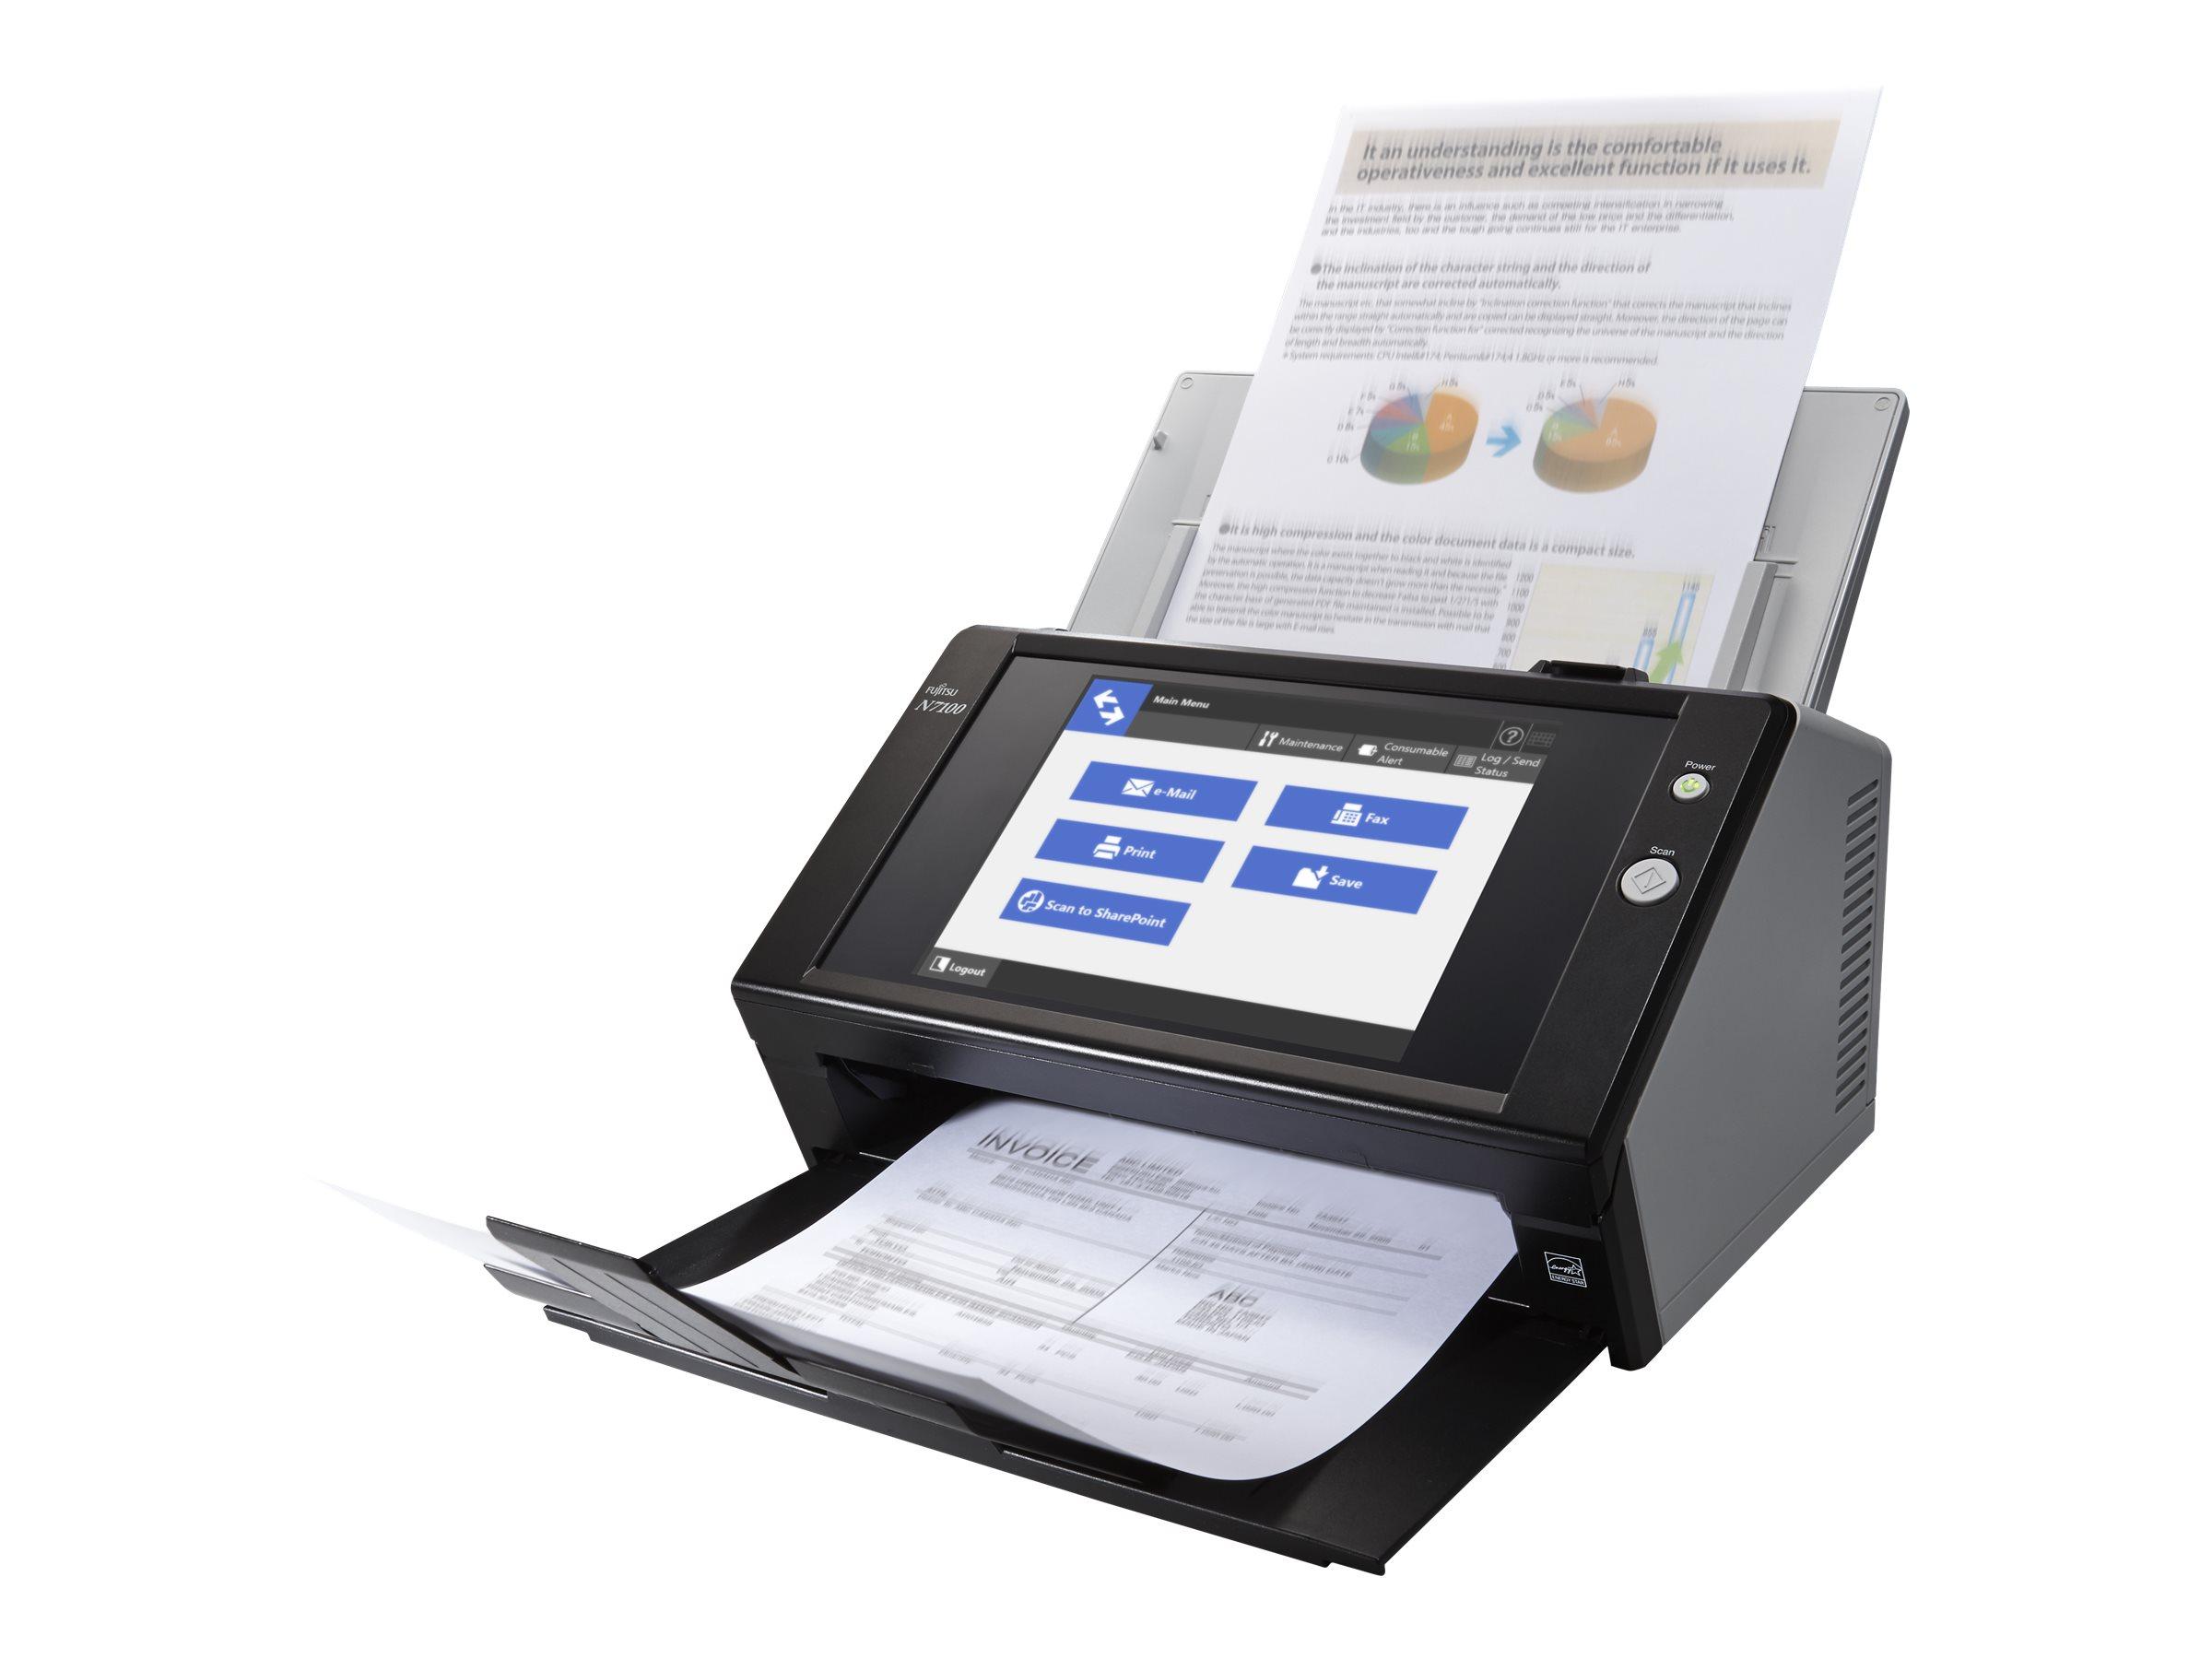 Fujitsu Network Scanner N7100 - Dokumentenscanner - Dual CIS - Duplex - 216 x 355.6 mm - 600 dpi x 600 dpi